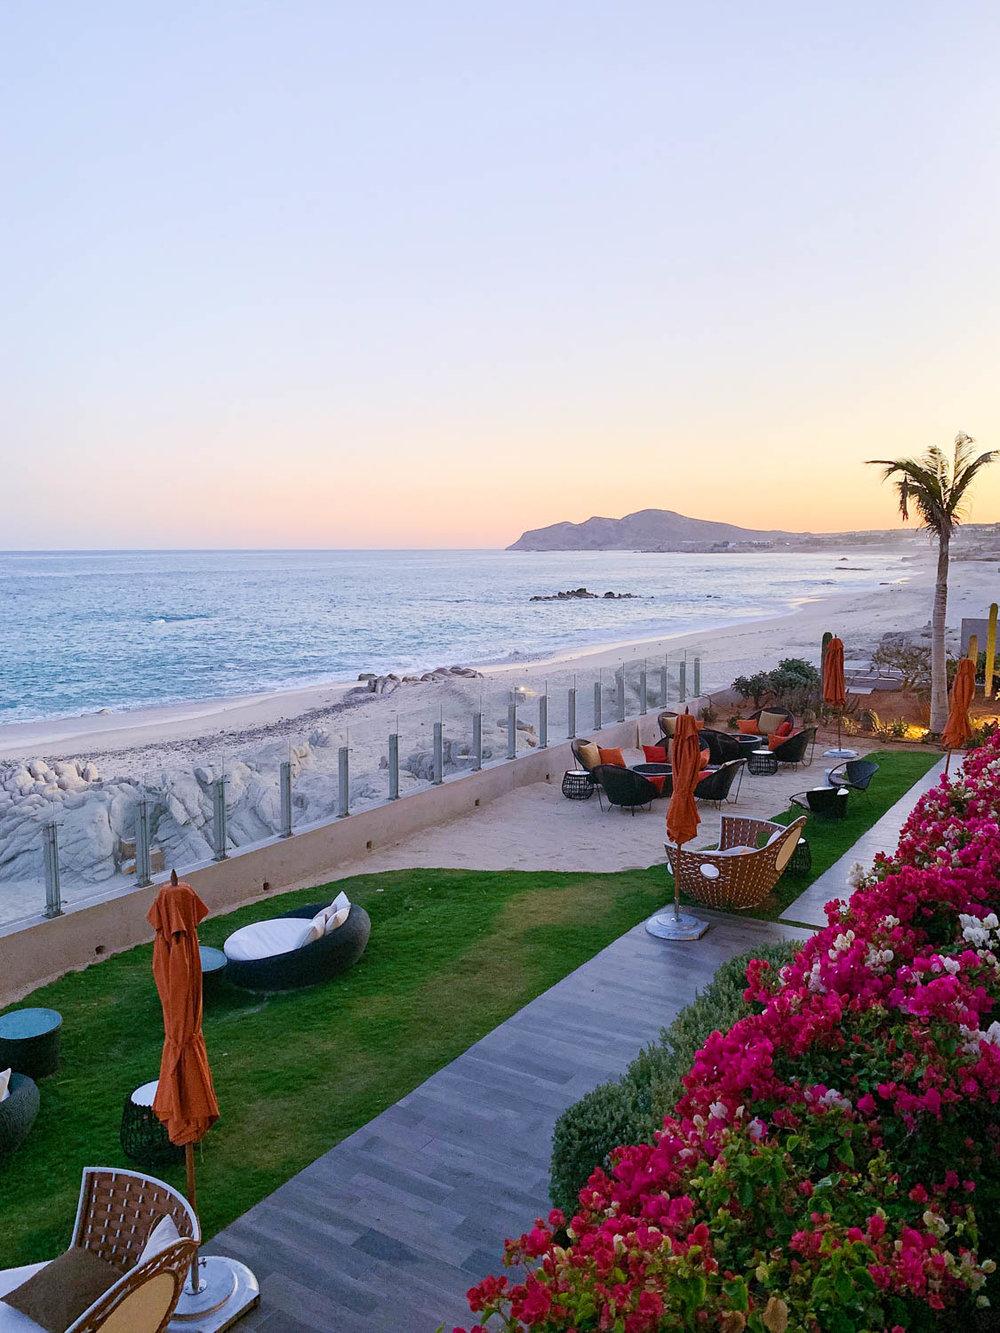 Best All-Inclusive Resort - Cabo All Inclusive Resort - Cabo Resort-11.jpg